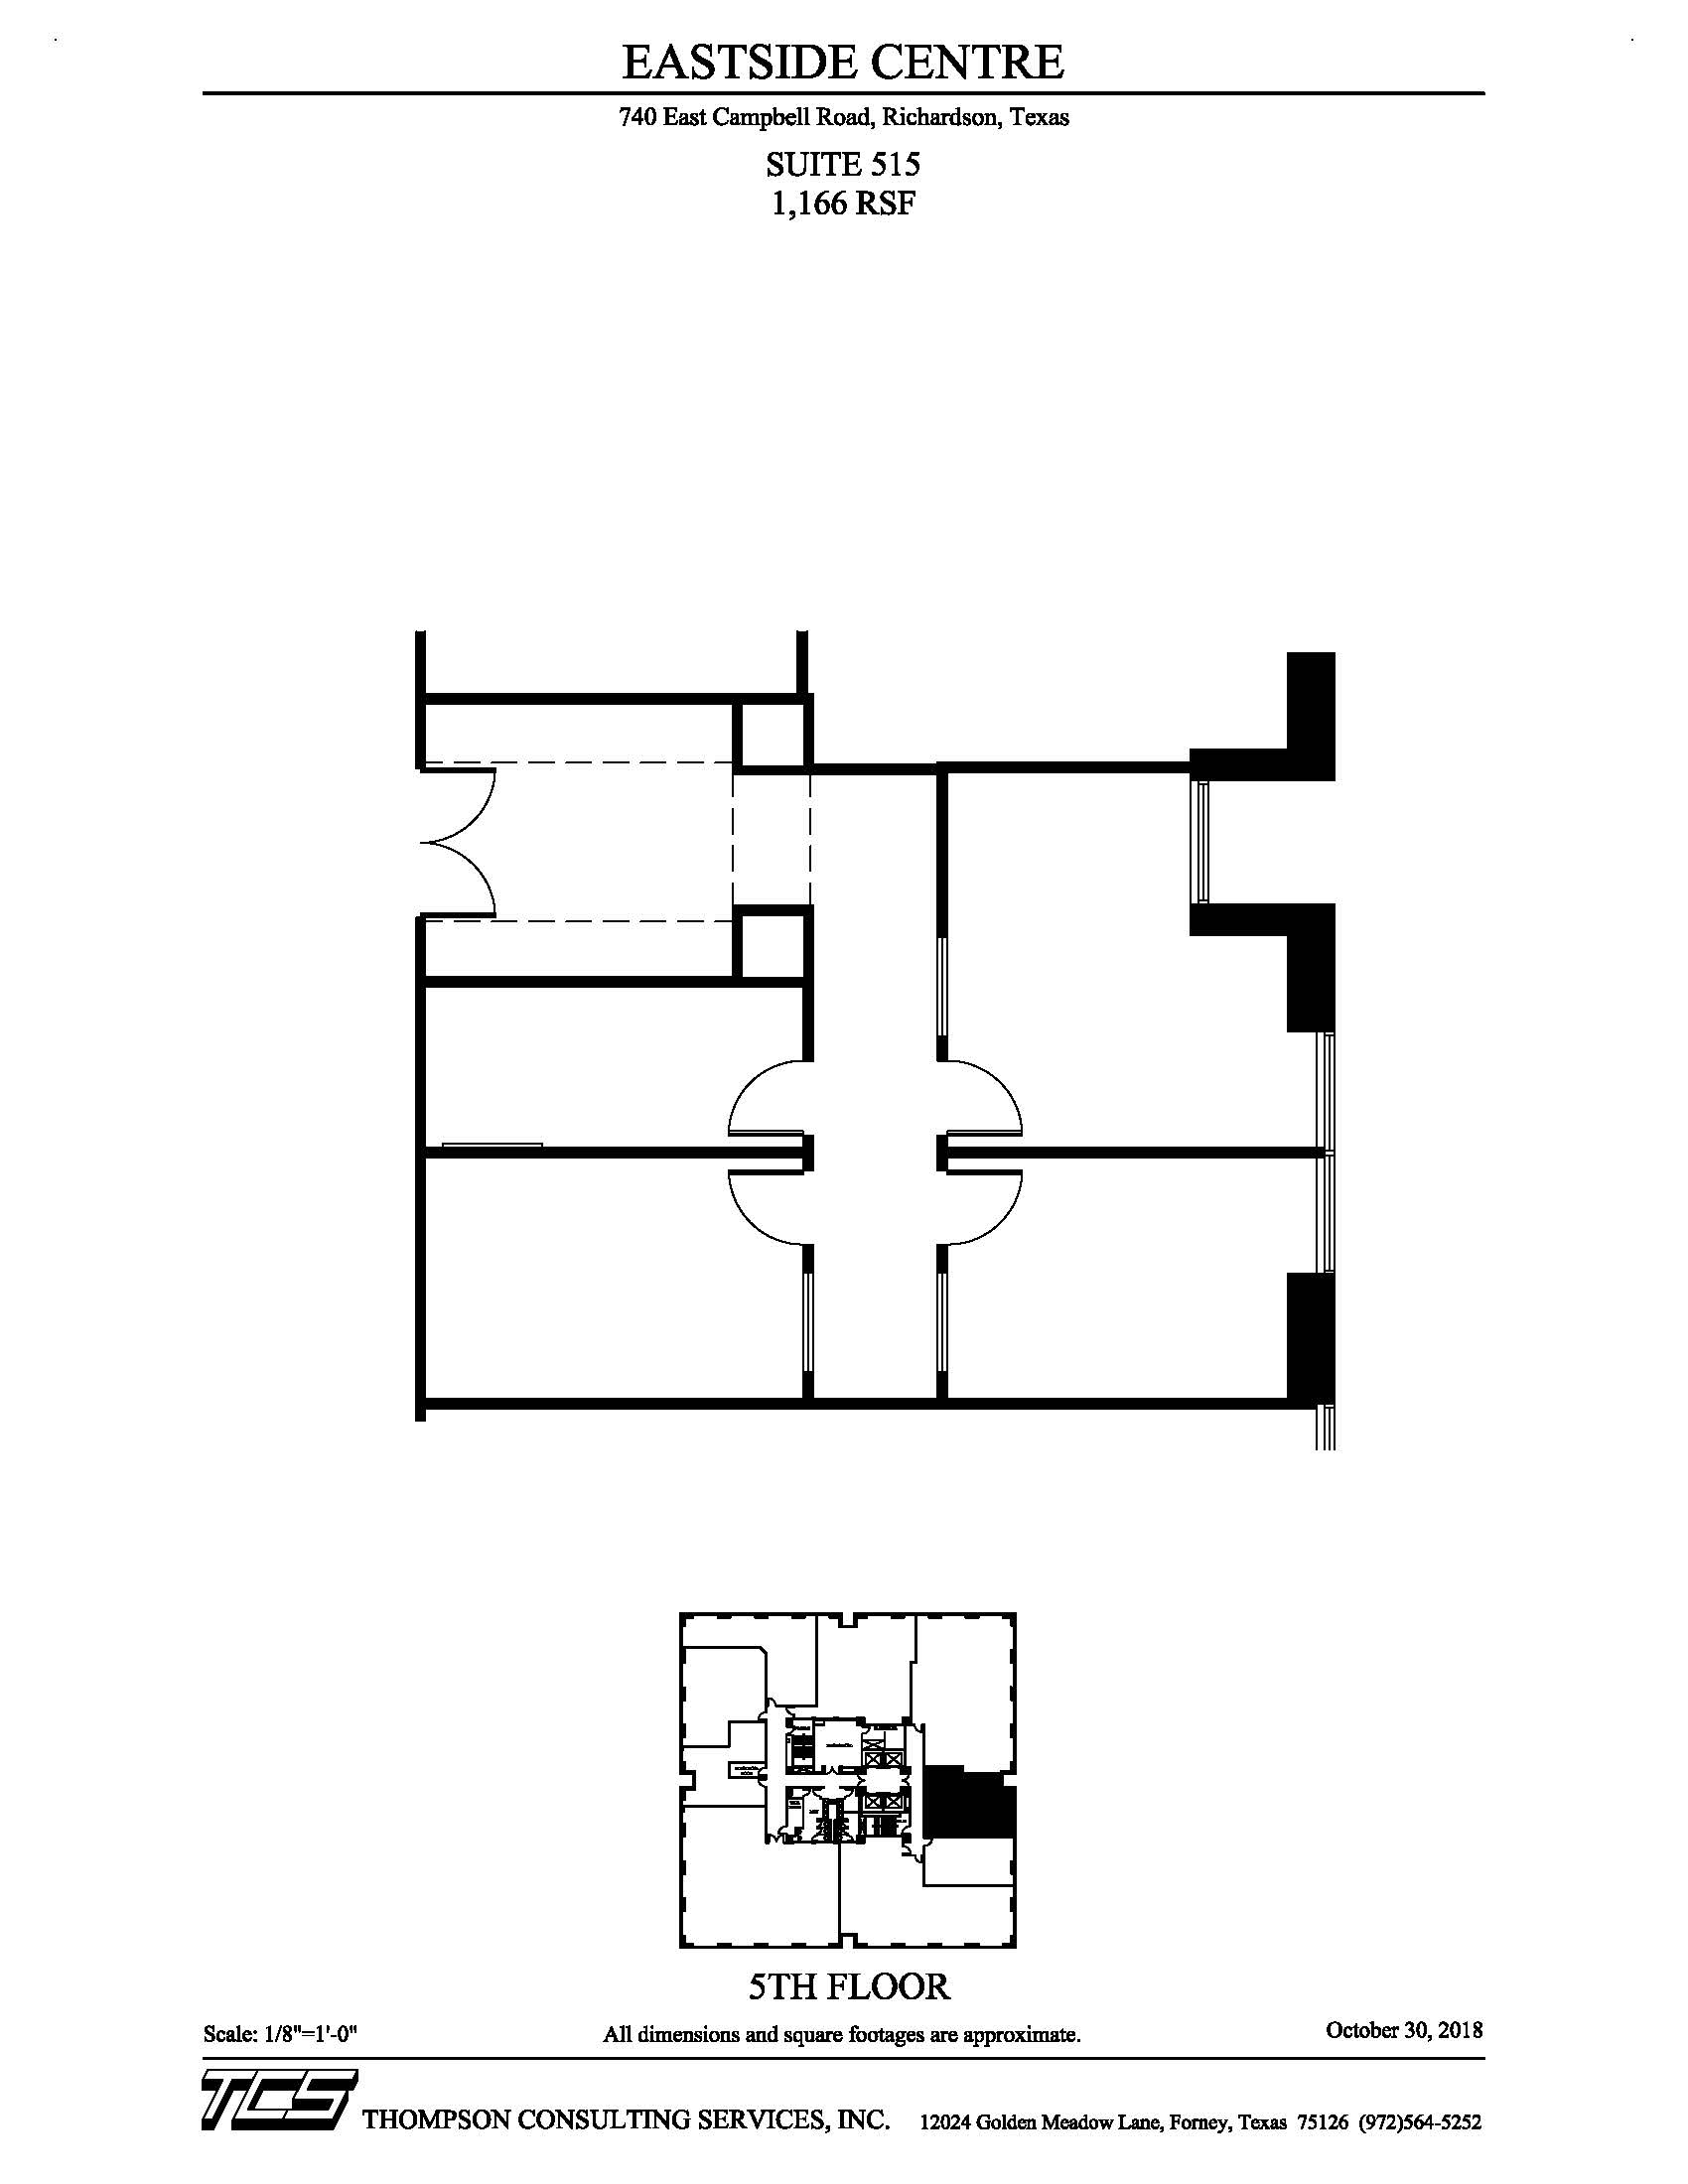 Eastside Centre - Suite 515 - As Built.jpg